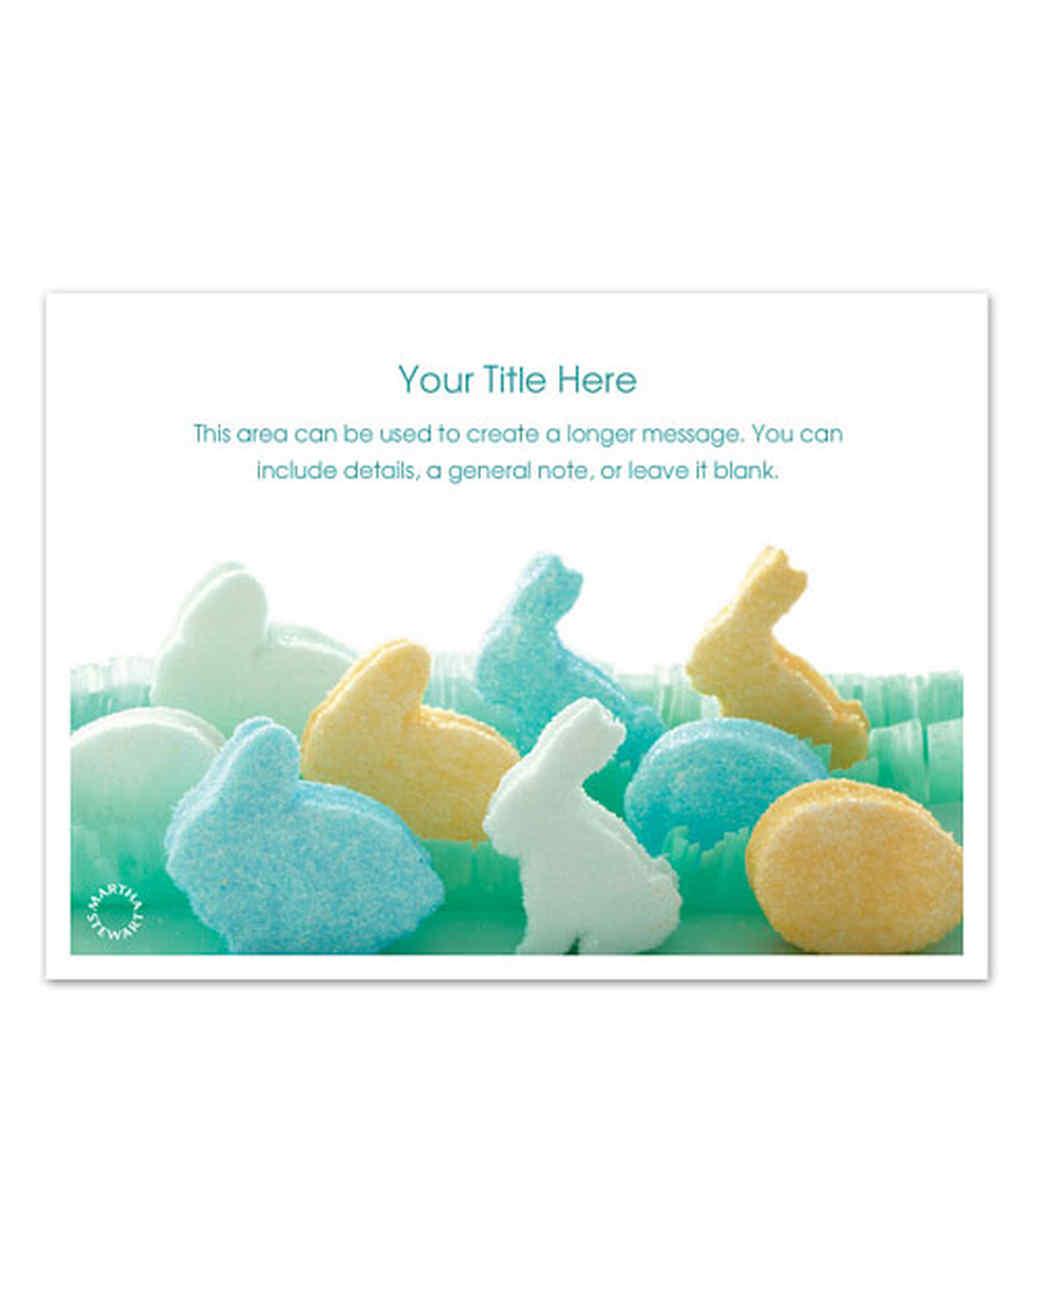 ping-marshmallow-bunnies.jpg